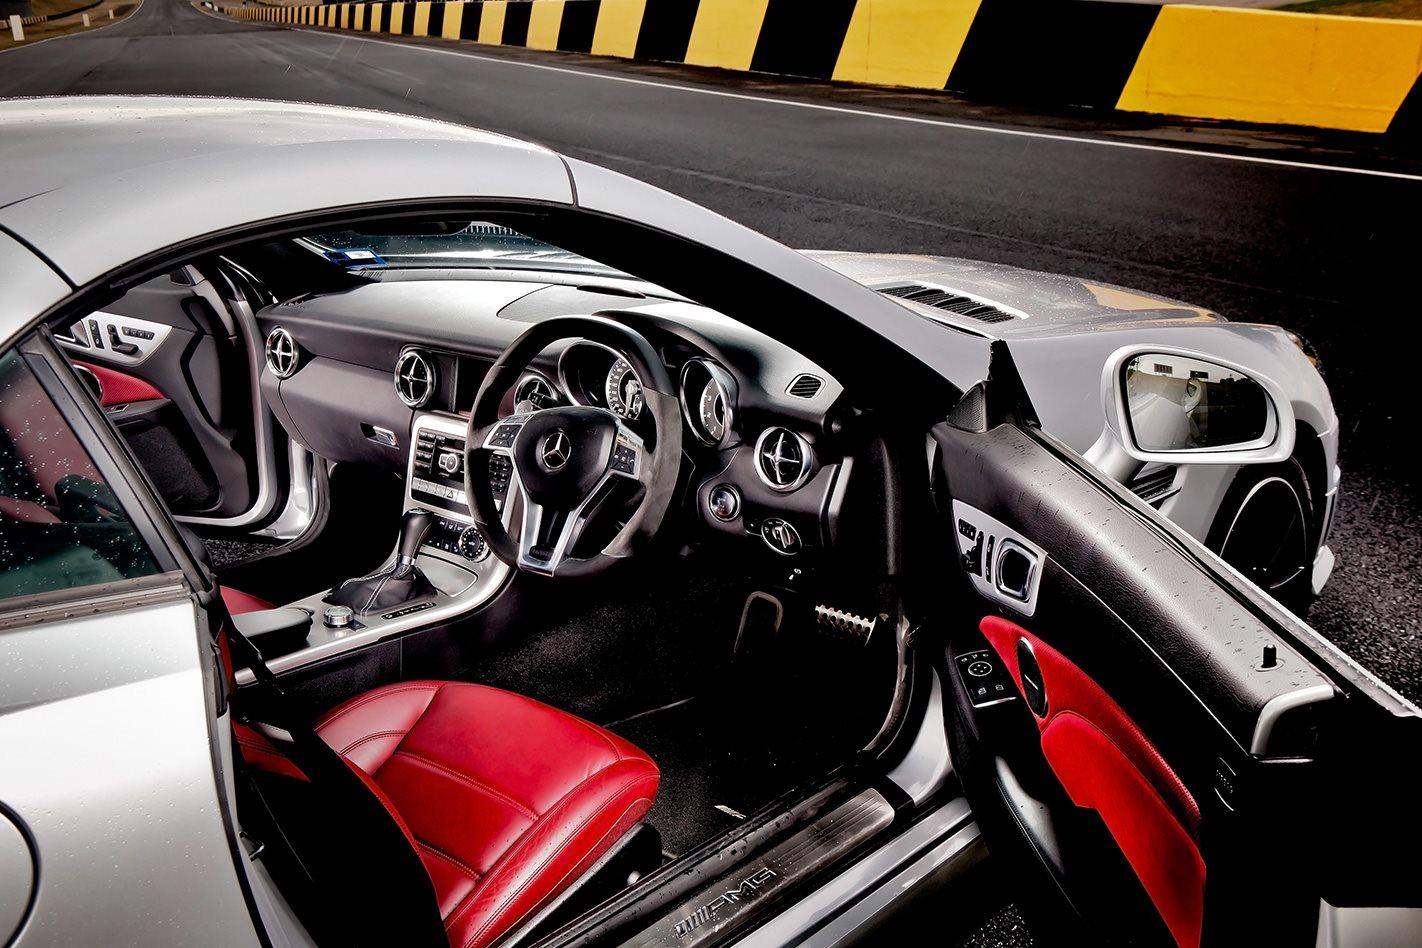 2012-Mercedes-Benz-SLK-55-AMG-interior.jpg